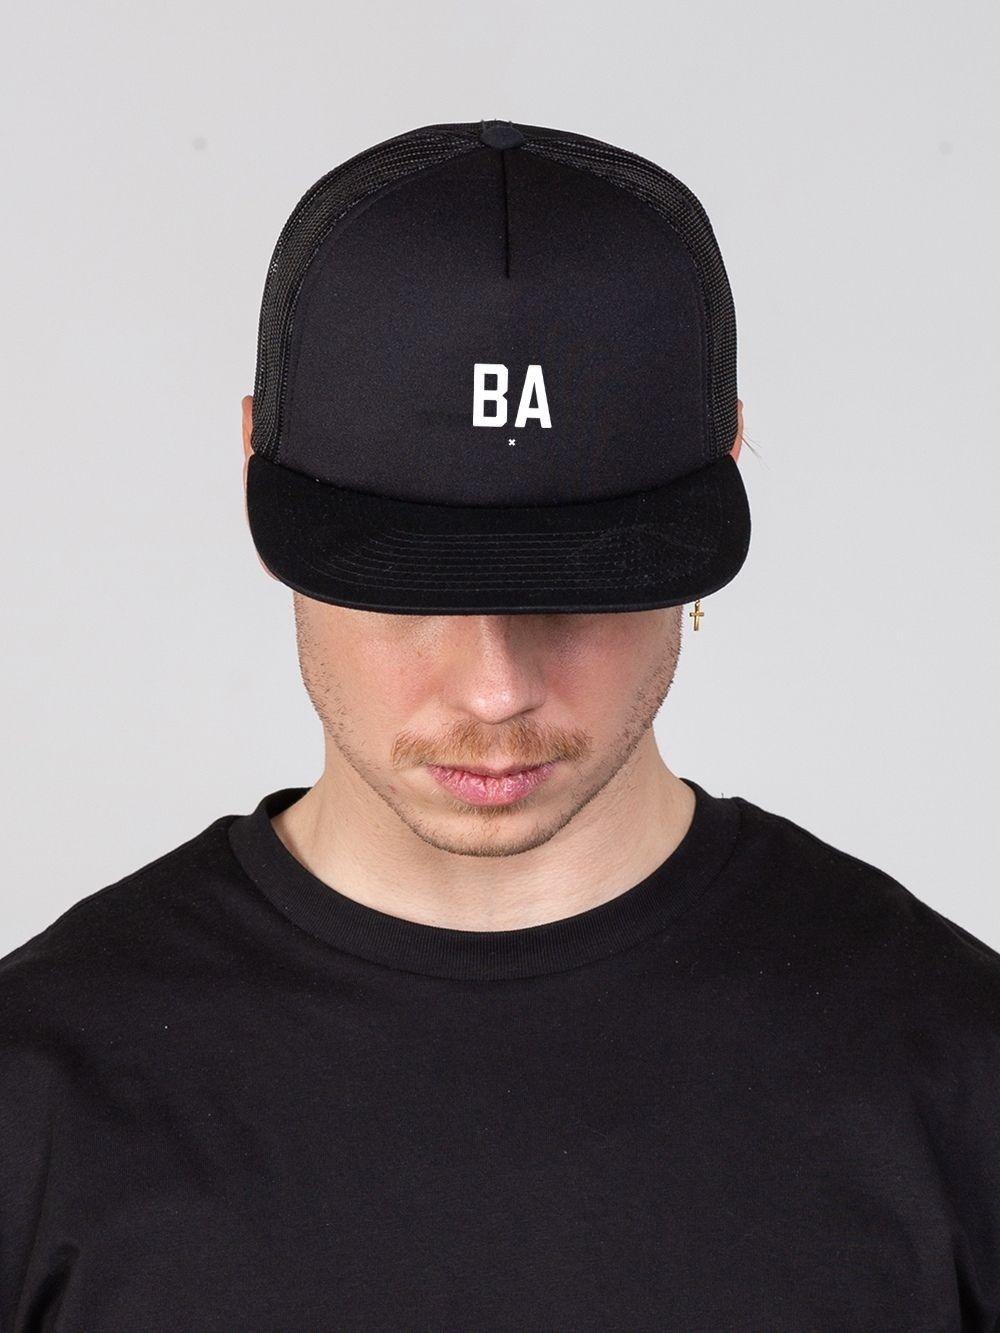 BA Trucker